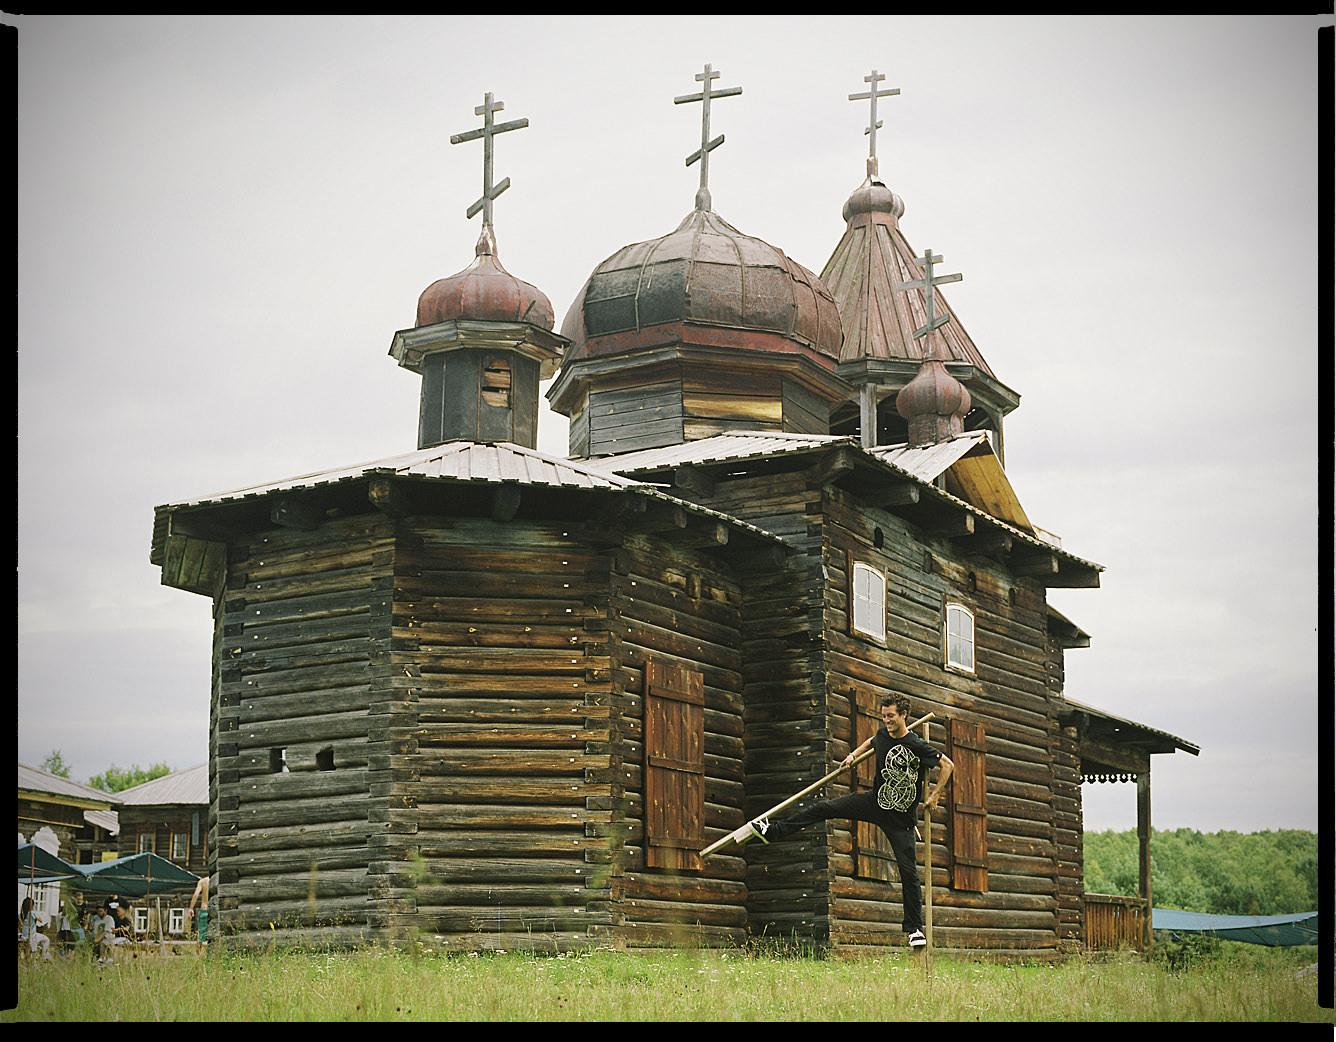 MediumFormatPatrikWallner_Irkutsk_MichiOneLegLOWQ-1